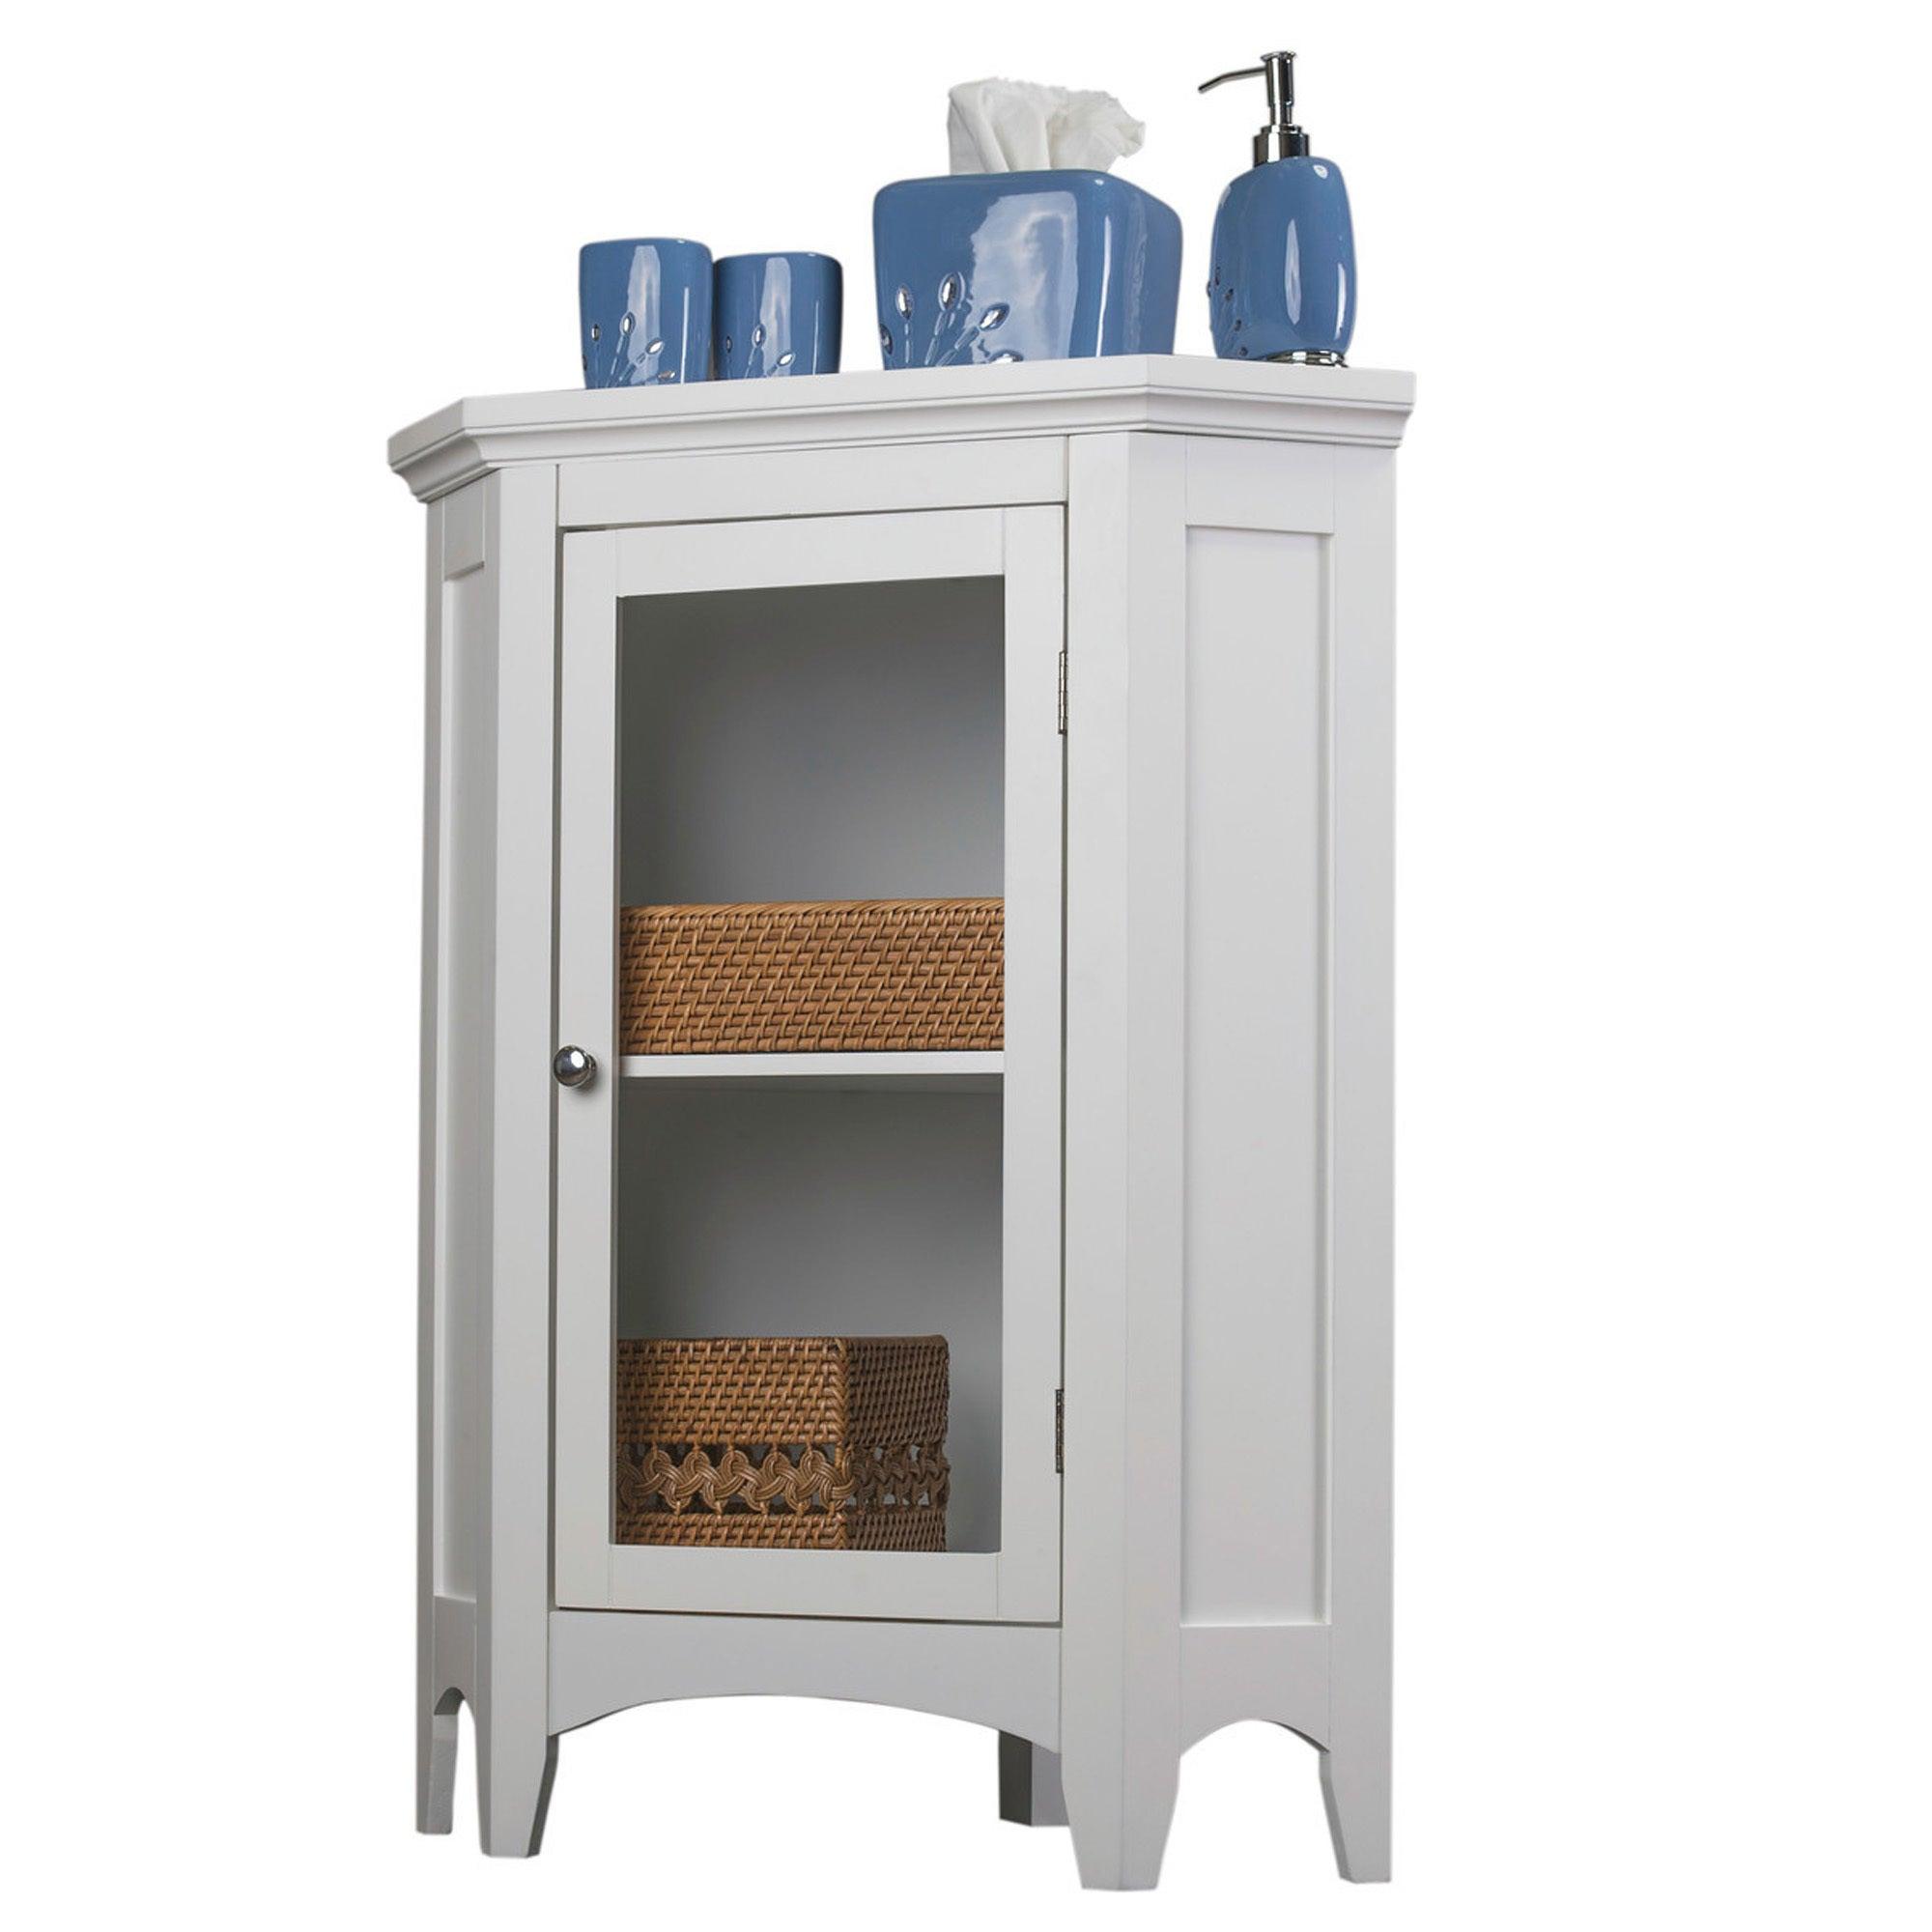 2 Shelves Home Bathroom Storage Furniture Corner Compact Floor Cabinet White New